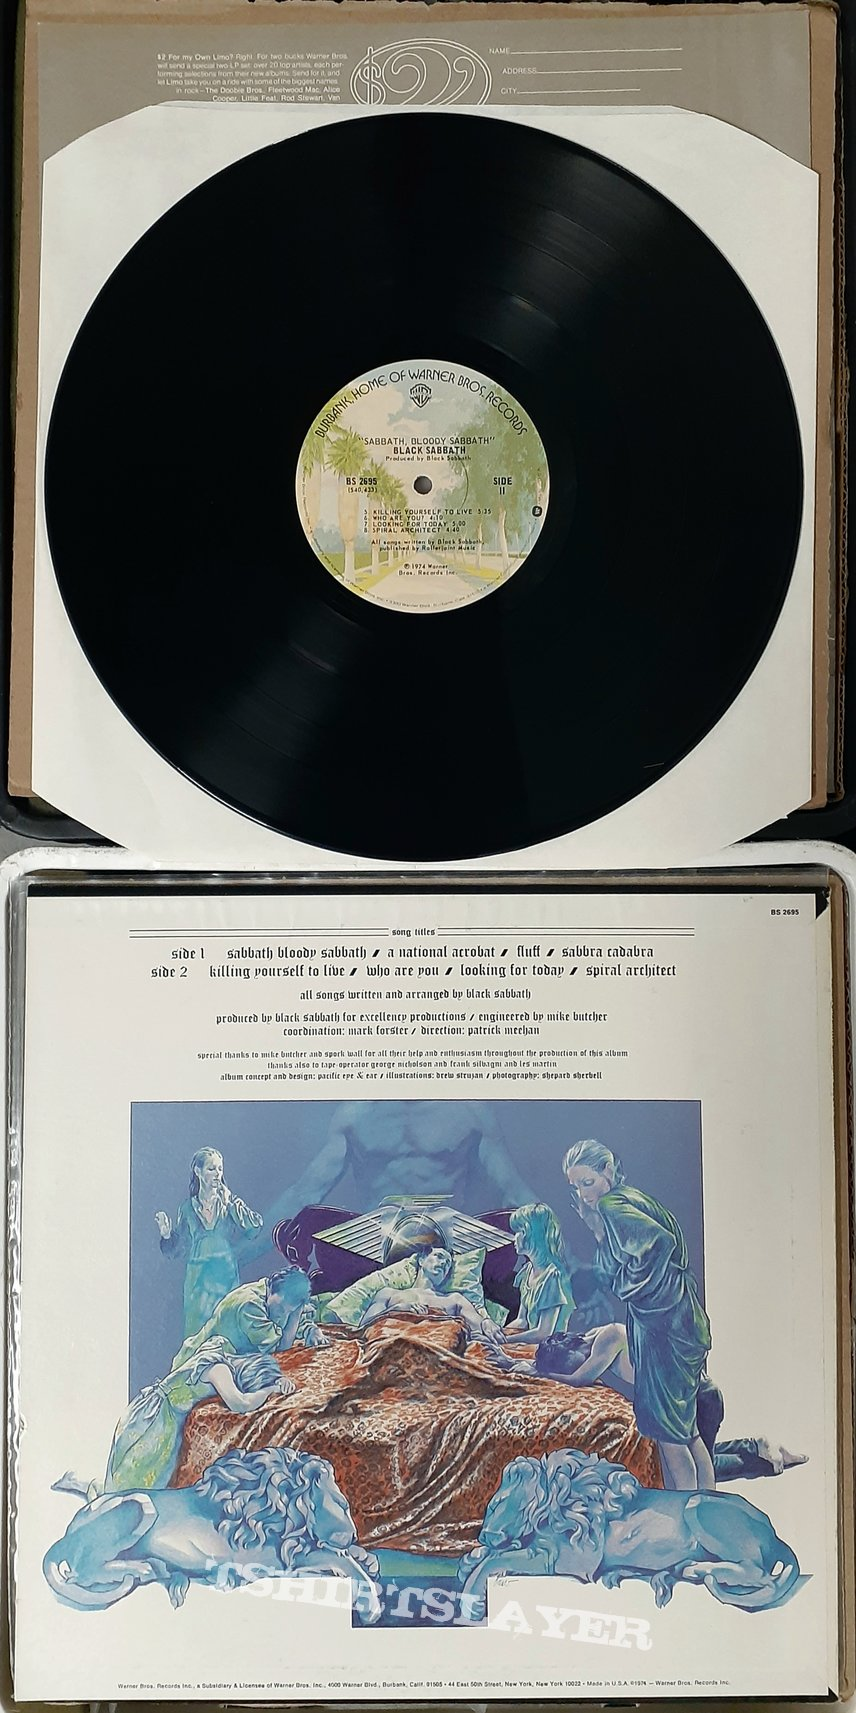 Black Sabbath/ Sabbath Bloody Sabbath/ lp w/ poster/ U.S. Pressing (1973)